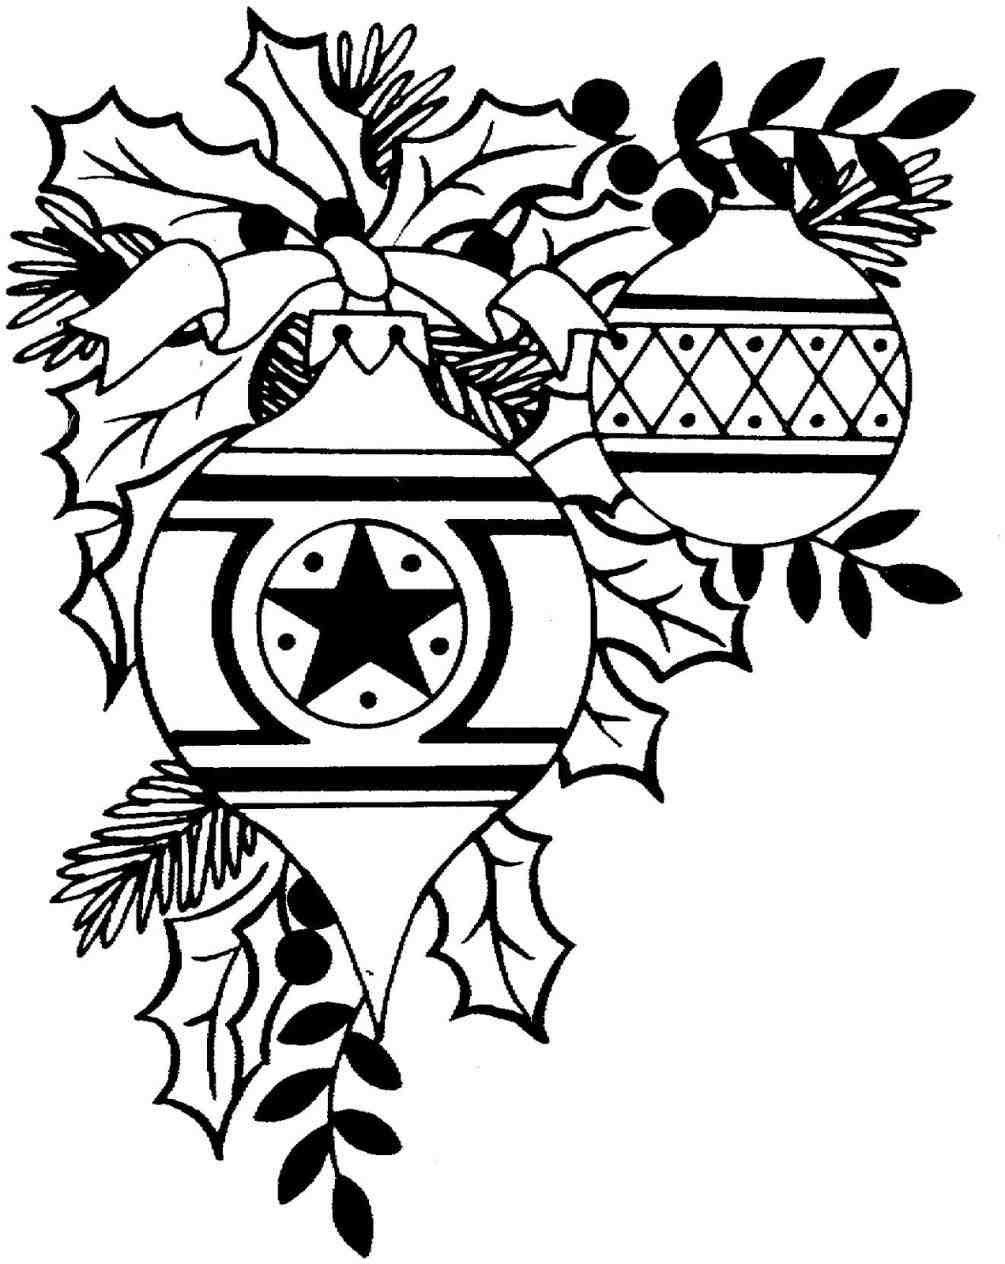 1005x1264 Pa Free Christmas Clip Art Black And White Border Border Free